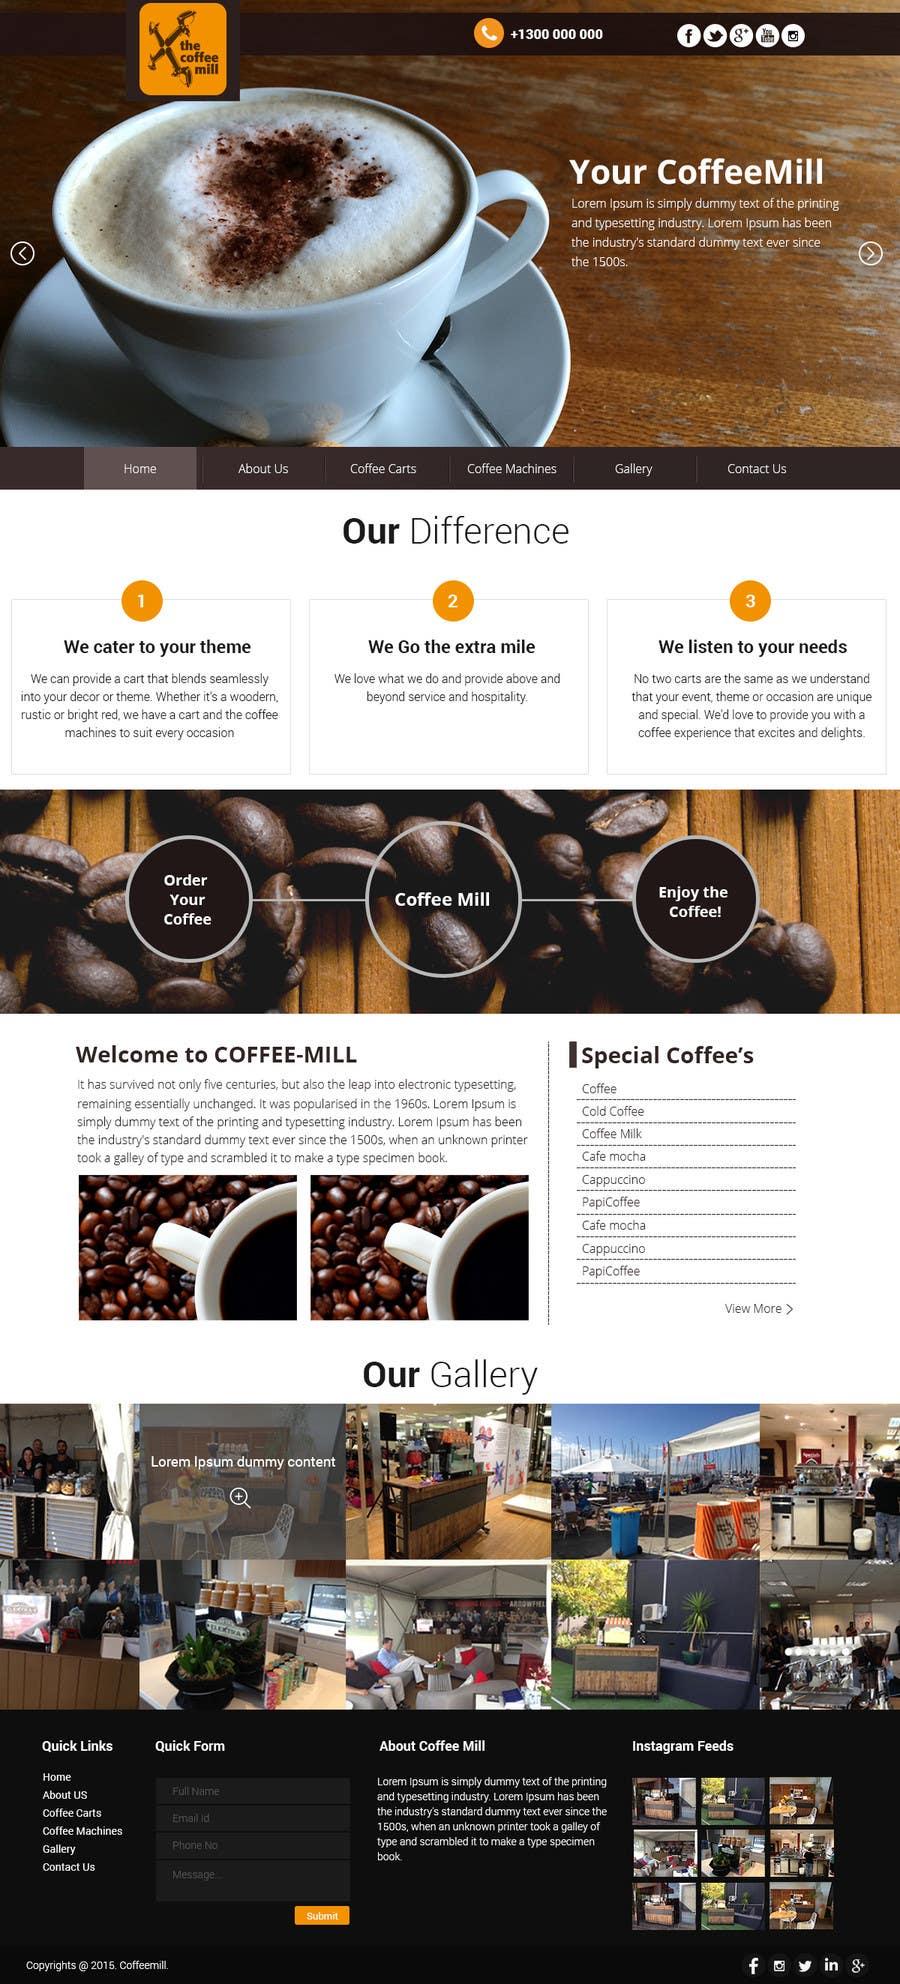 Konkurrenceindlæg #                                        18                                      for                                         Design a Website Mockup for a Mobile Coffee Business